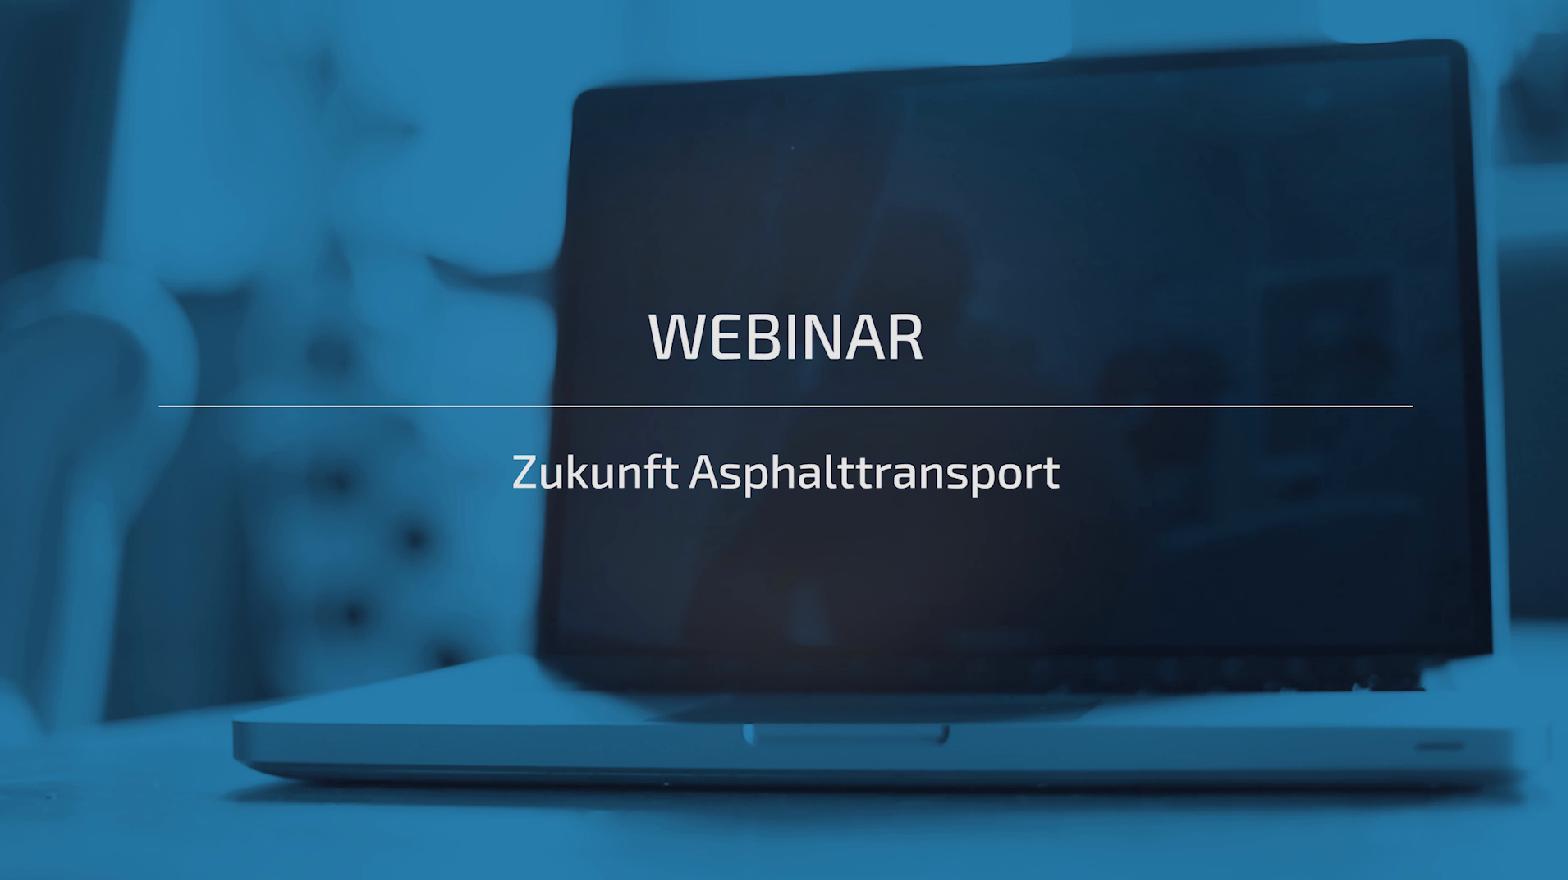 Webinar - Zukunft Asphalttransport